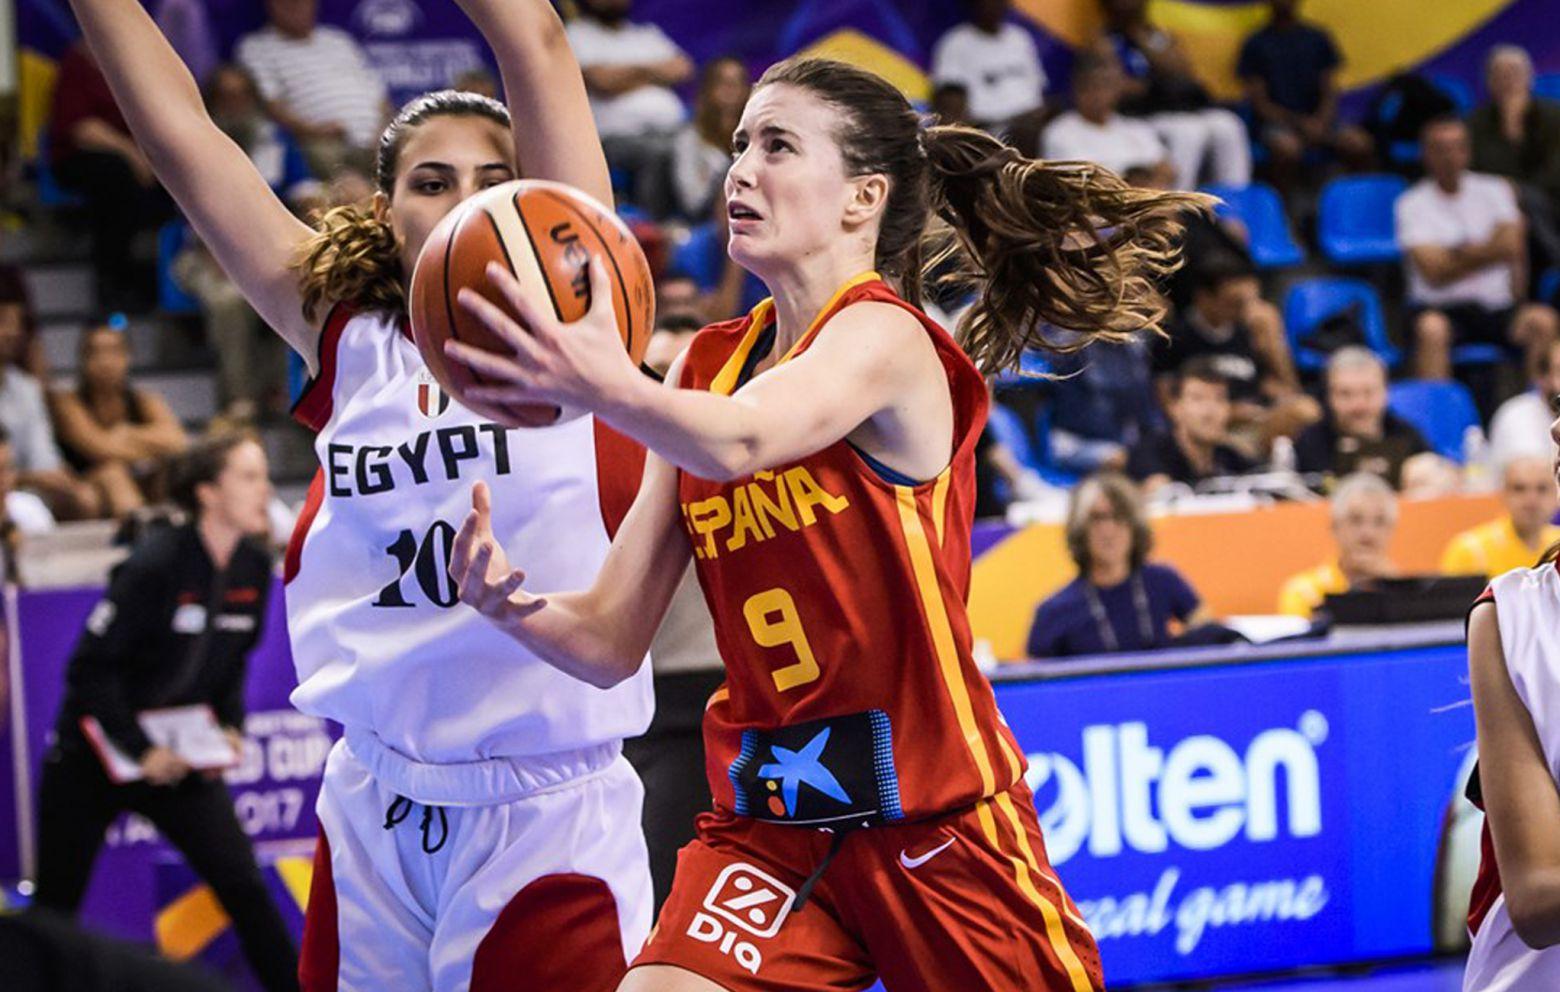 AINA AYUSO has signed with Femení Sant Adrià